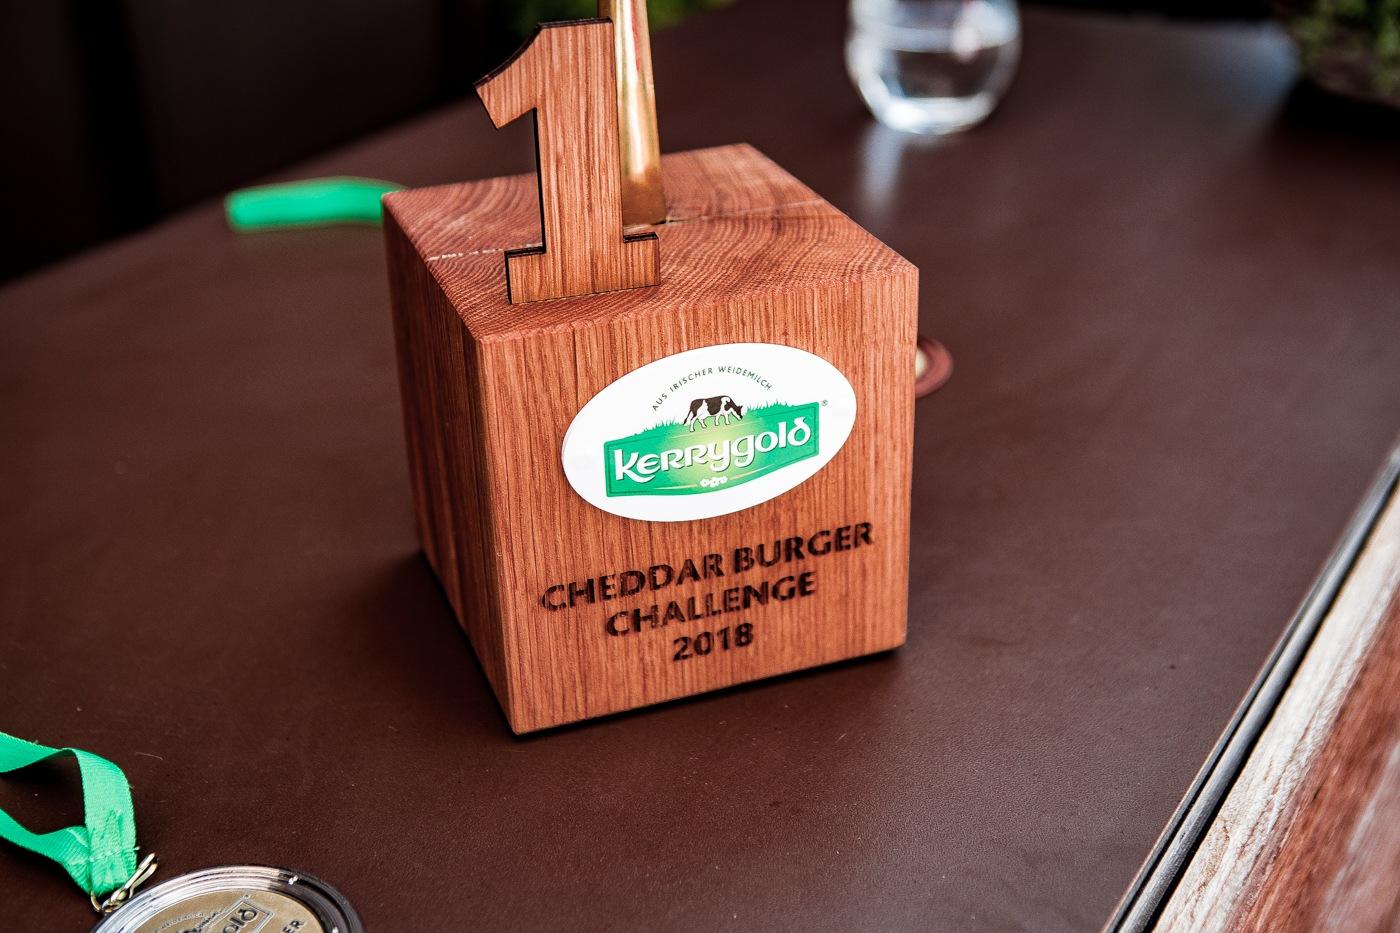 kerrygold-cheddar-burger-challenge-2018-20